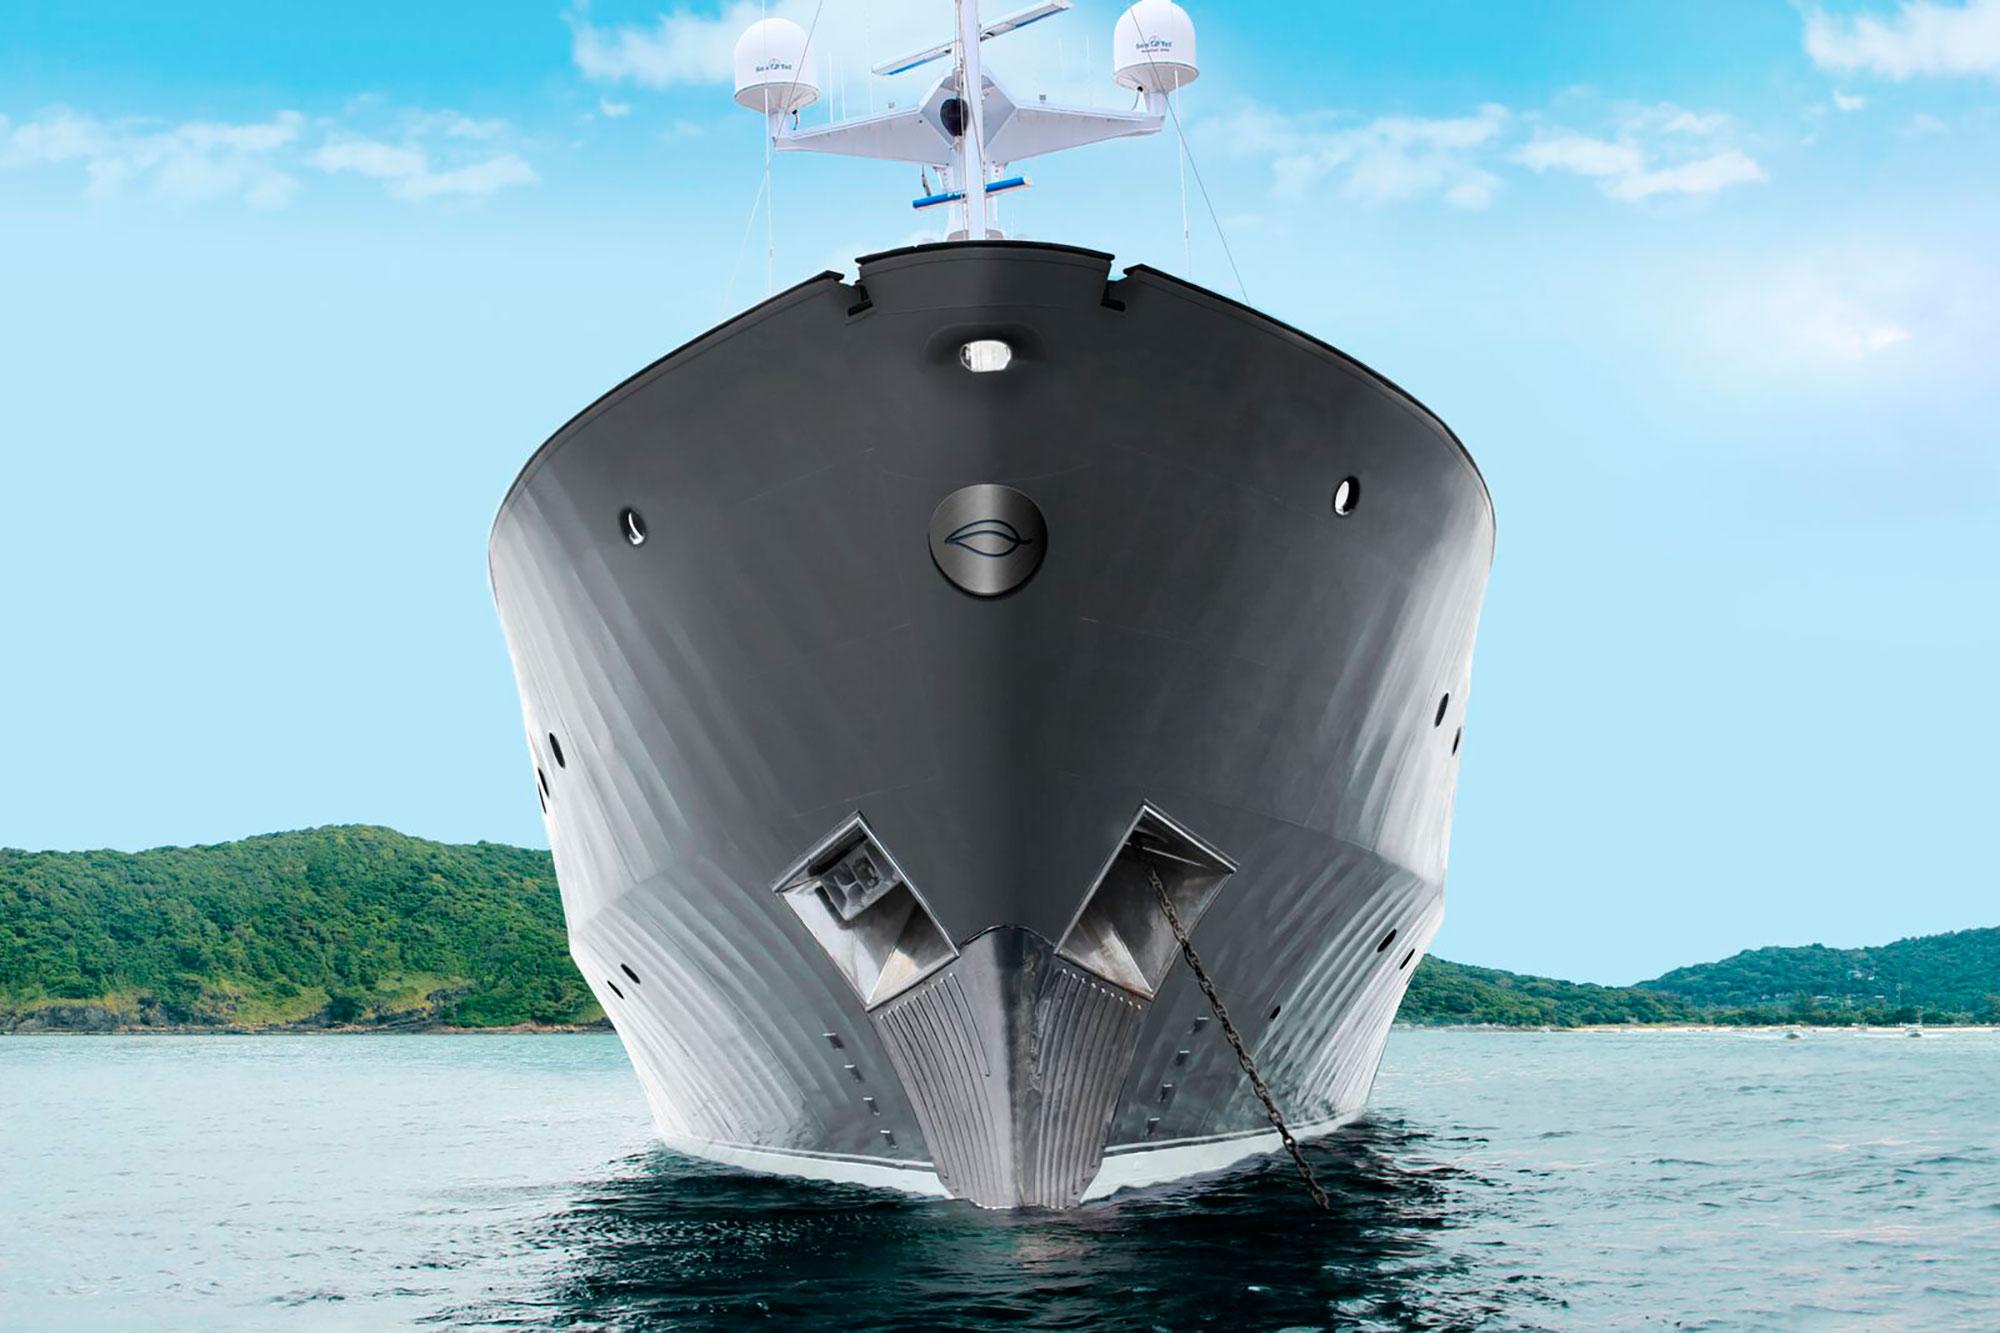 Crucero AQUA BLU de 7 noches - Ambon & Spice Islands - Indonesia- imagen #3